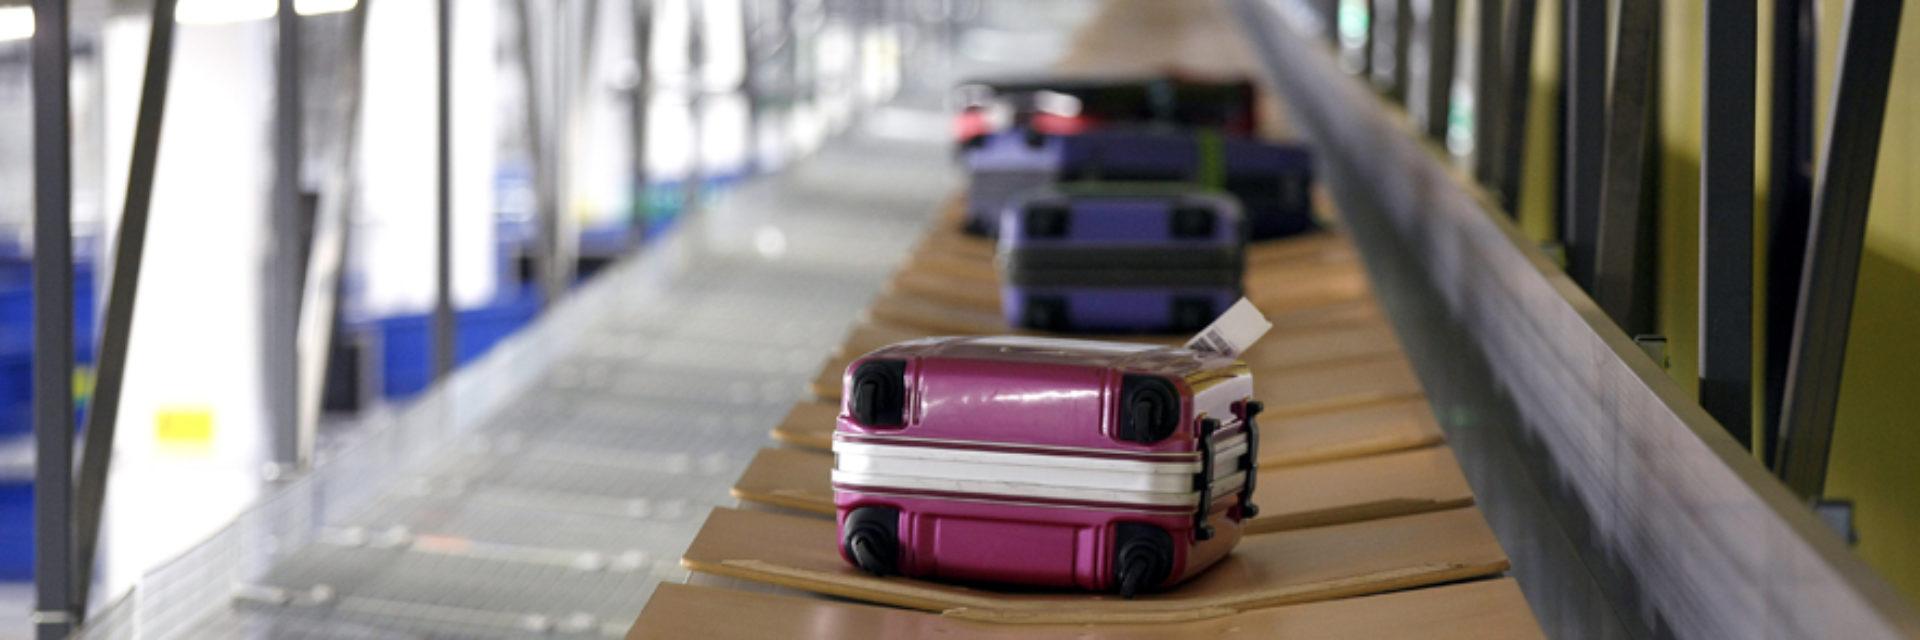 Tilt-tray sortation baggage handling